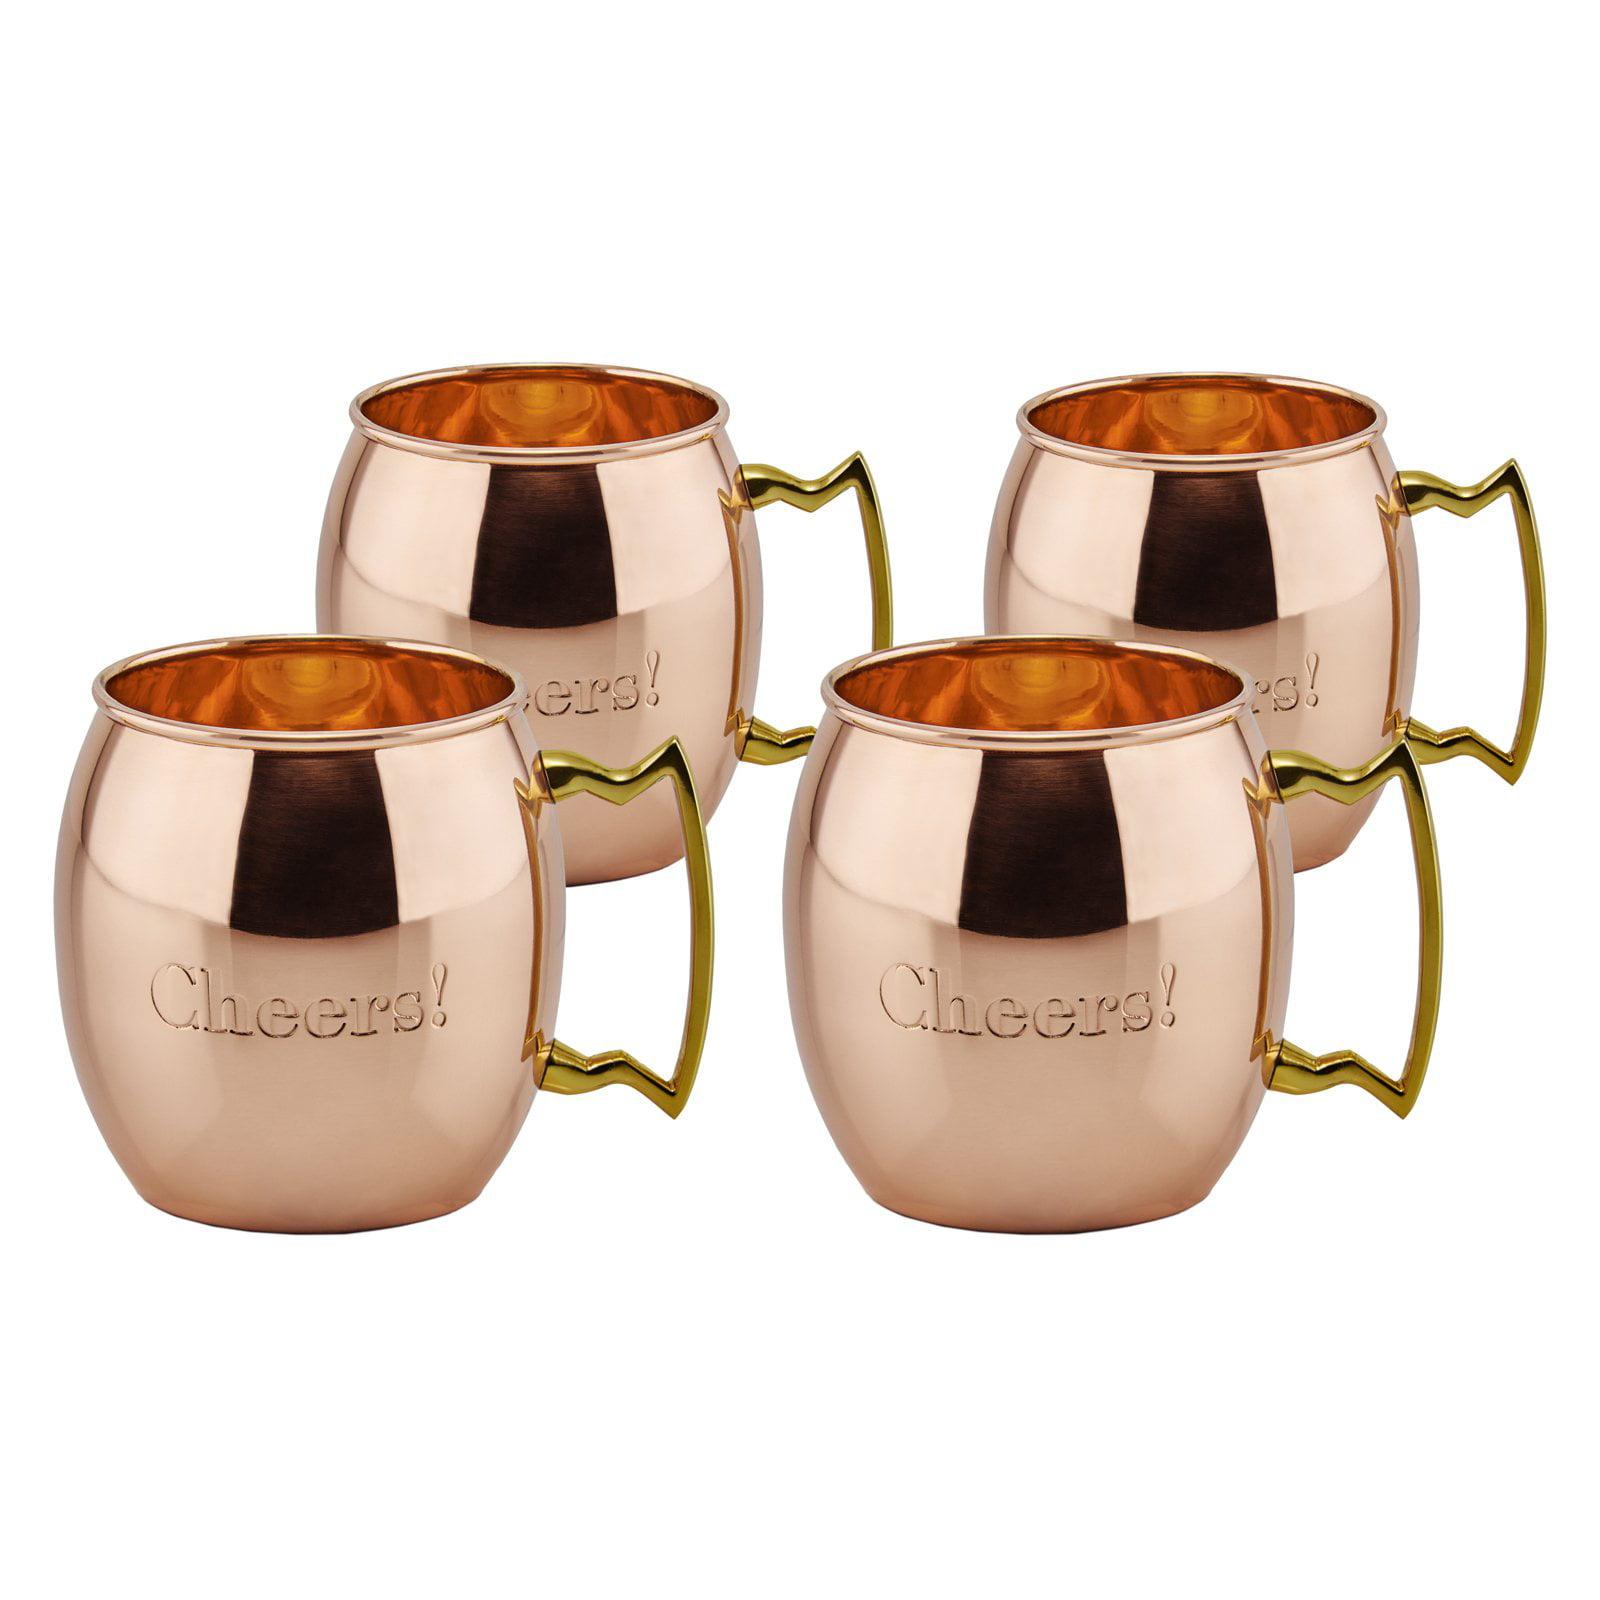 Old Dutch International Cheers! Moscow Mule Mugs - Set of 4